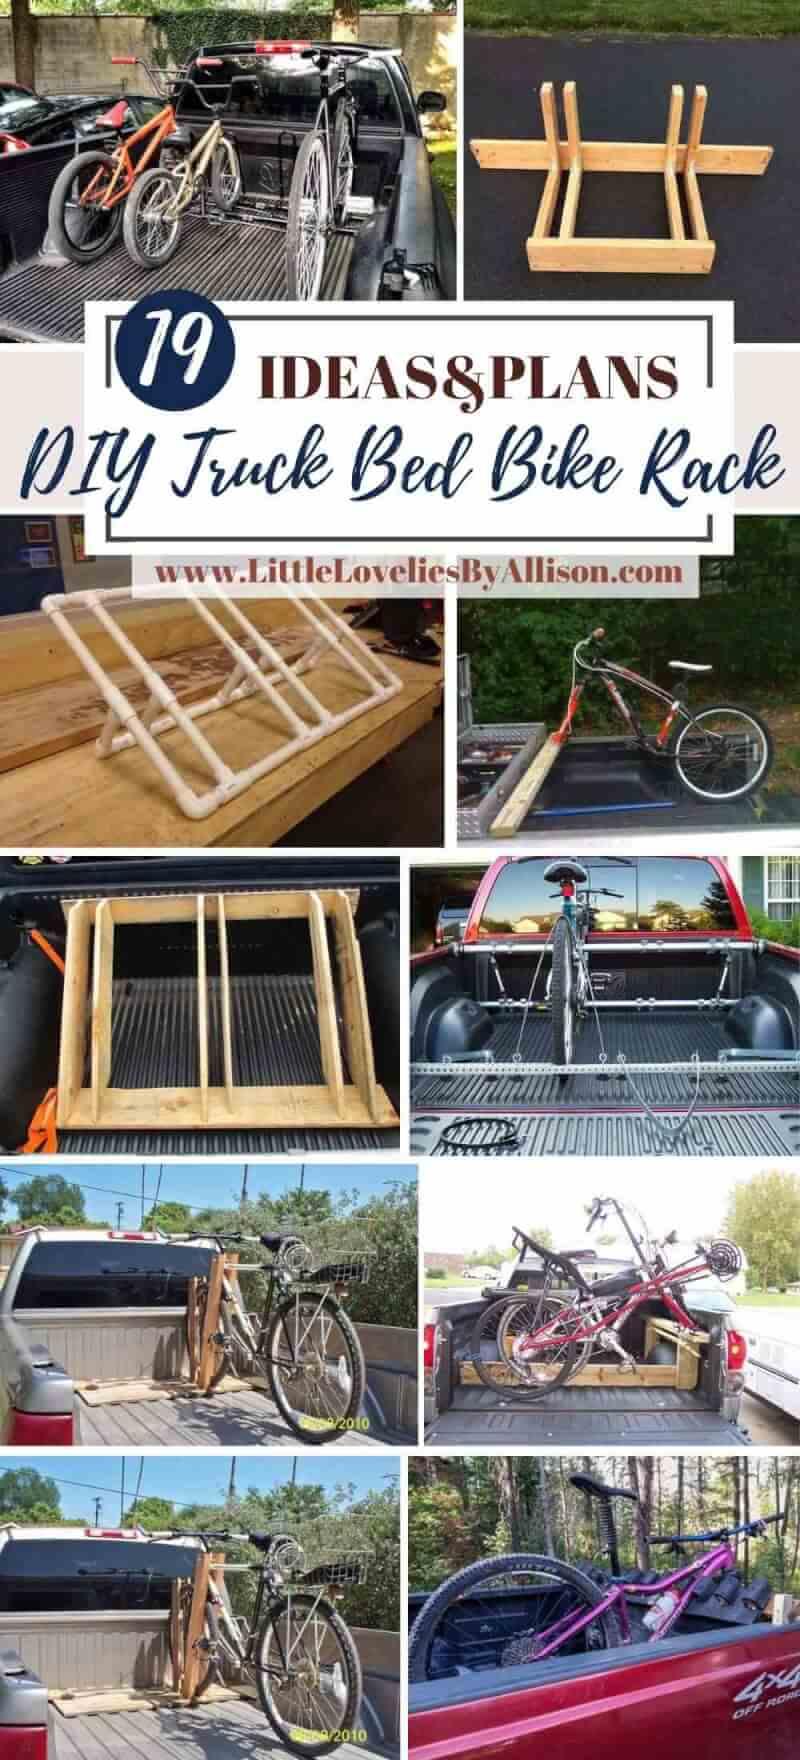 19 diy truck bed bike rack plans you